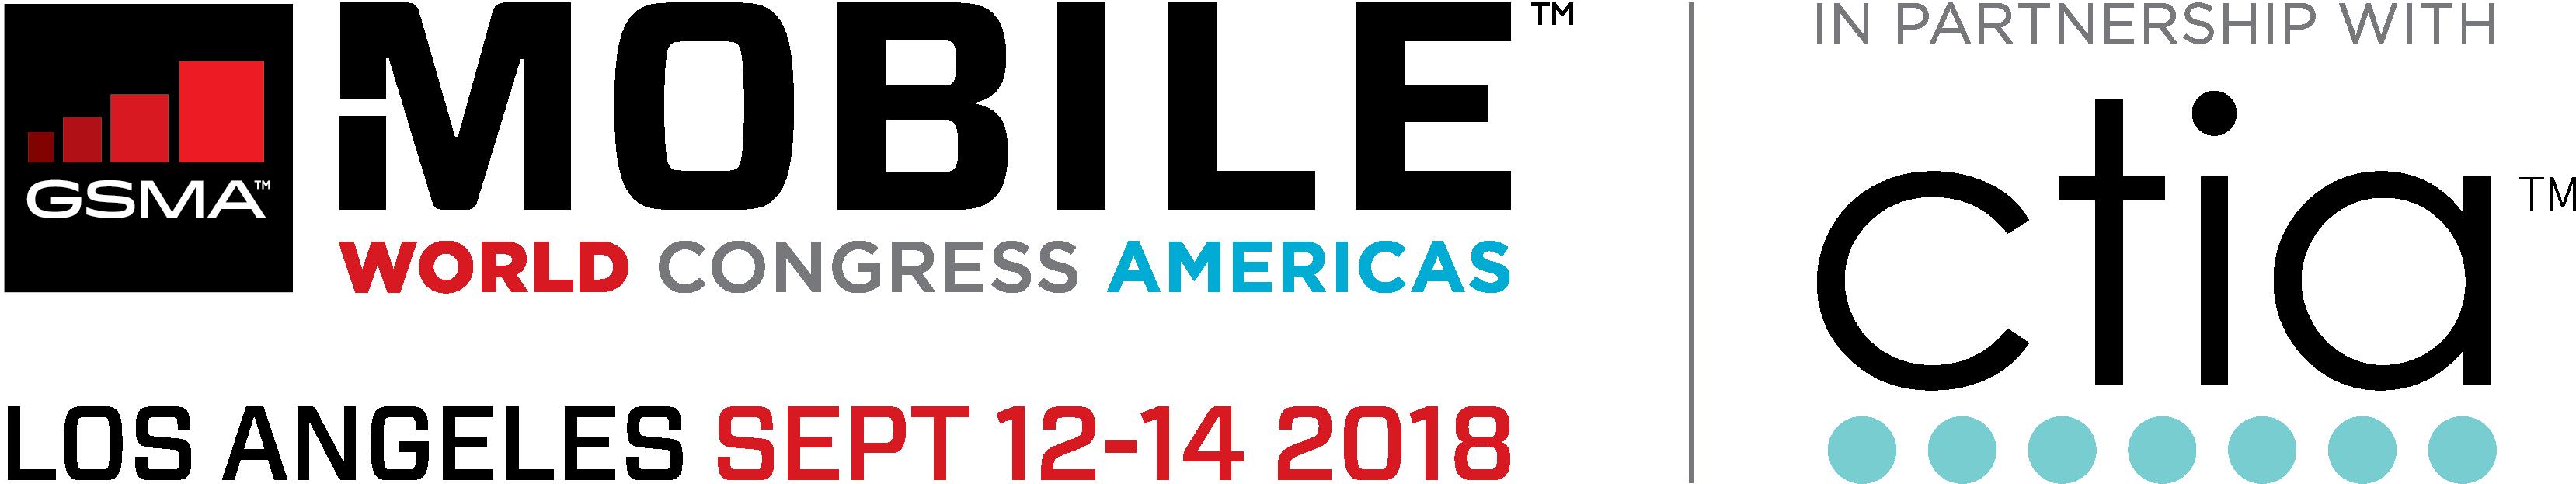 MWC Americas Global App Testing